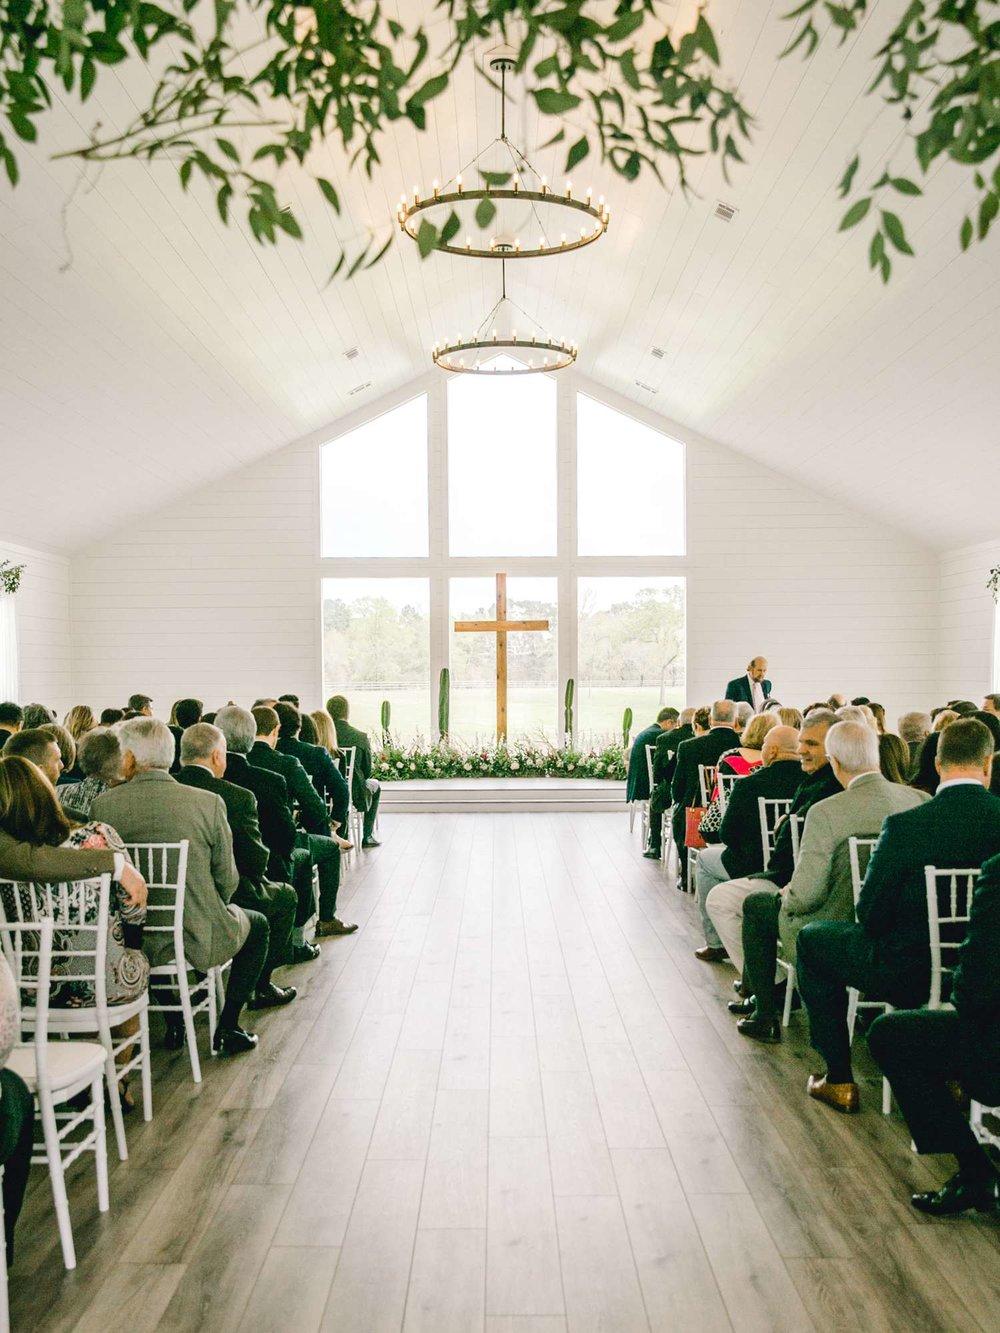 HEBERT_MORGAN_AND_CLAY_ALLEEJ_THE_FARMHOUSE_MONTGOMERY_TEXAS_WEDDING_0070.jpg